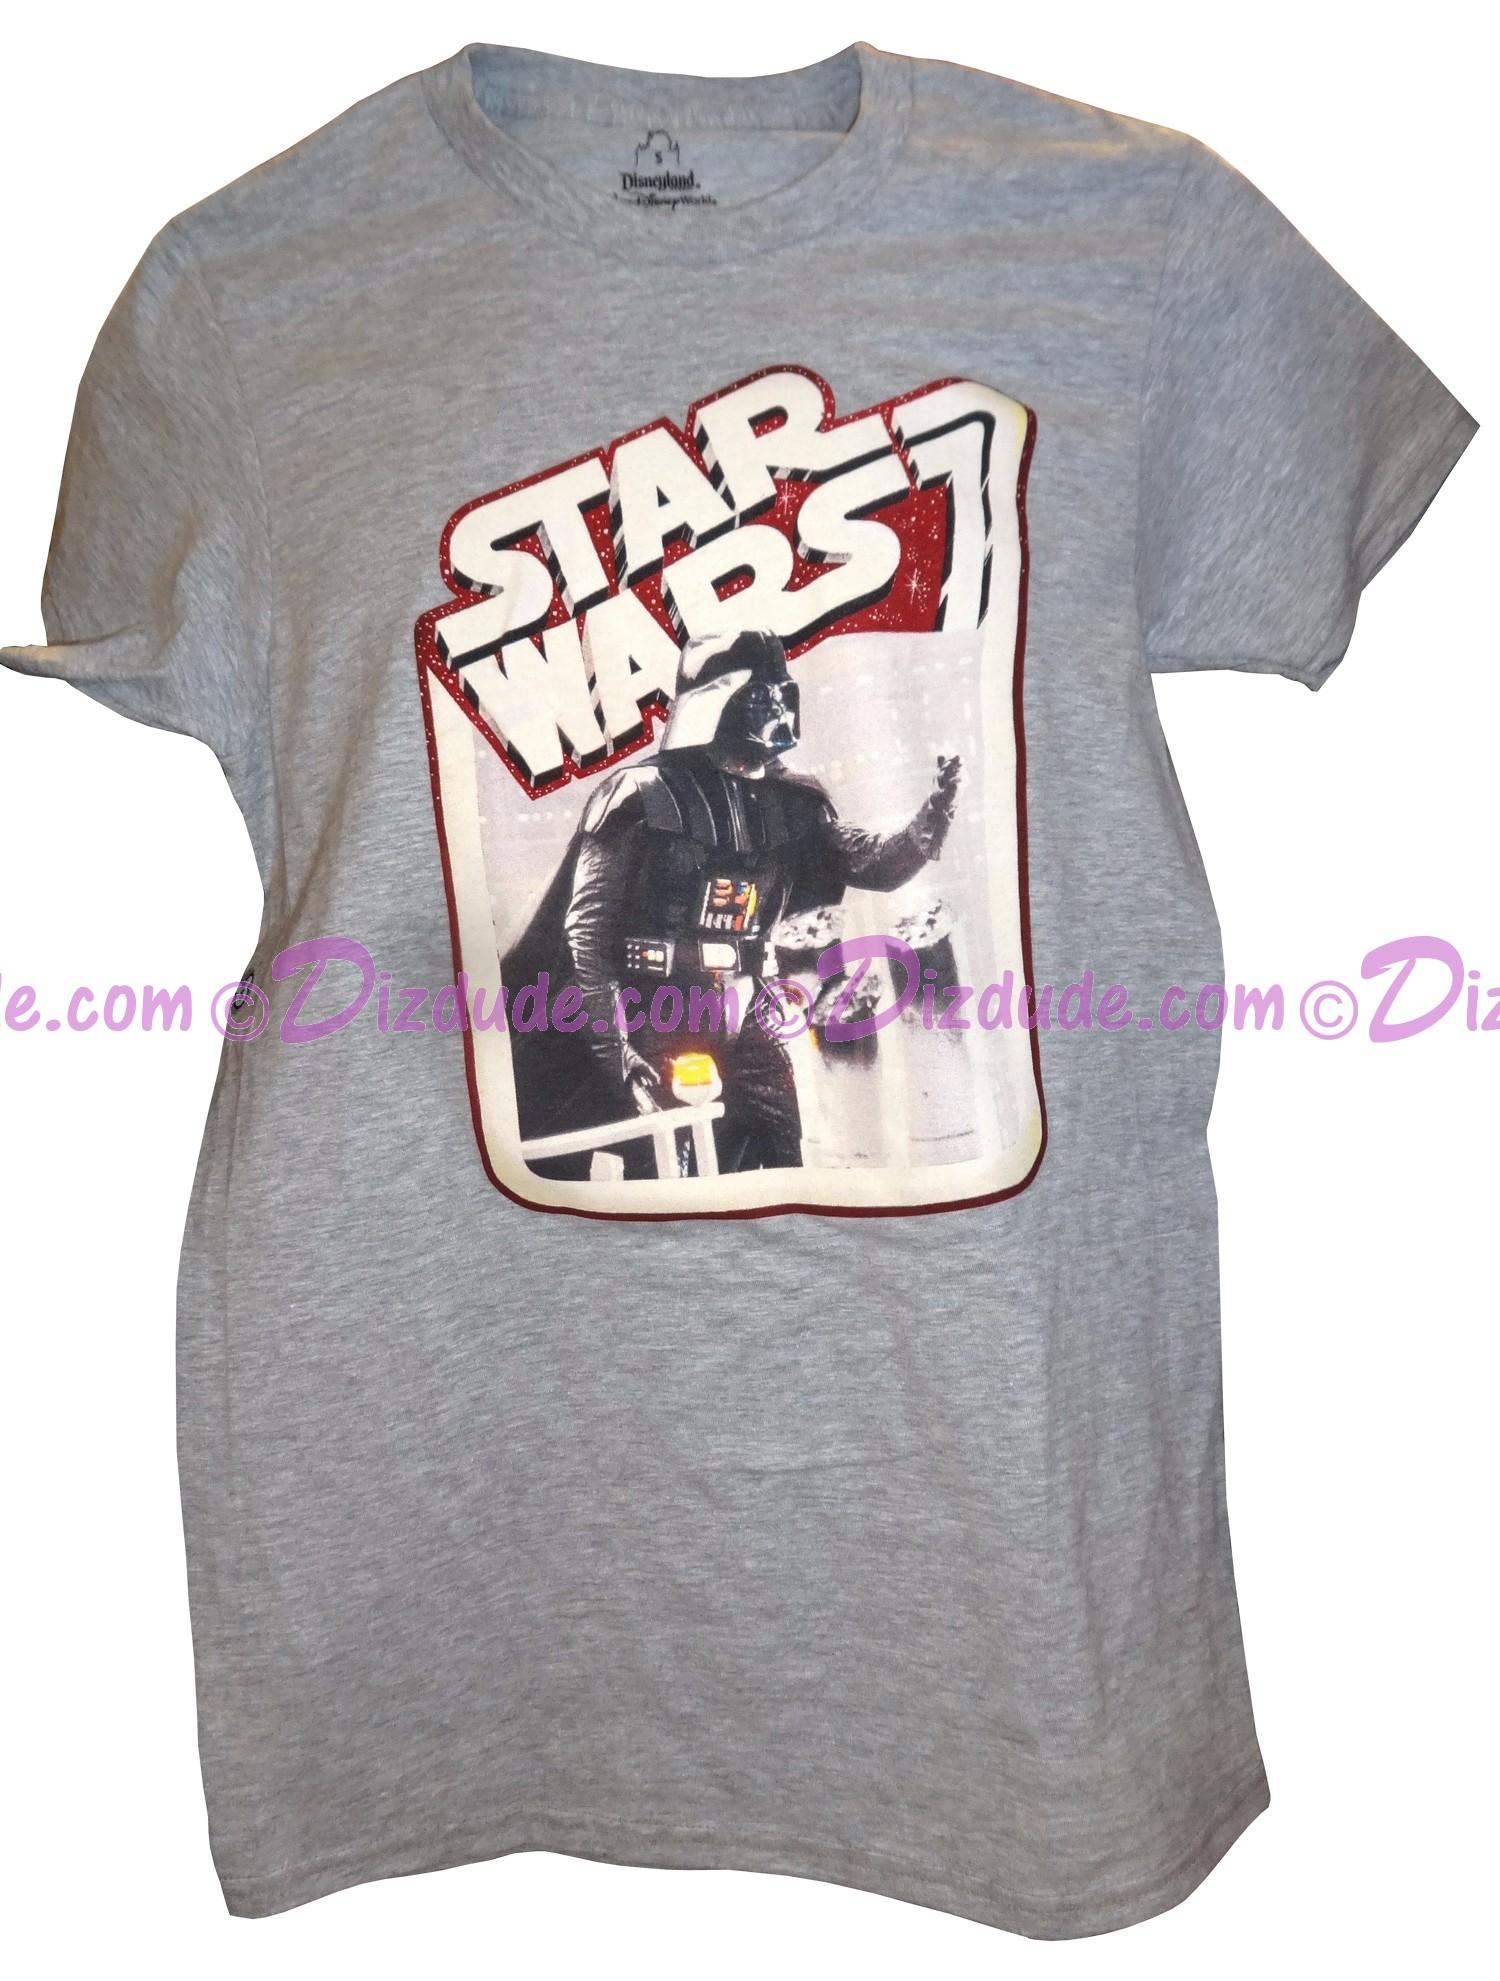 Disney Star Wars Darth Vader Adult T-Shirt (Tshirt, T shirt or Tee) © Dizdude.com